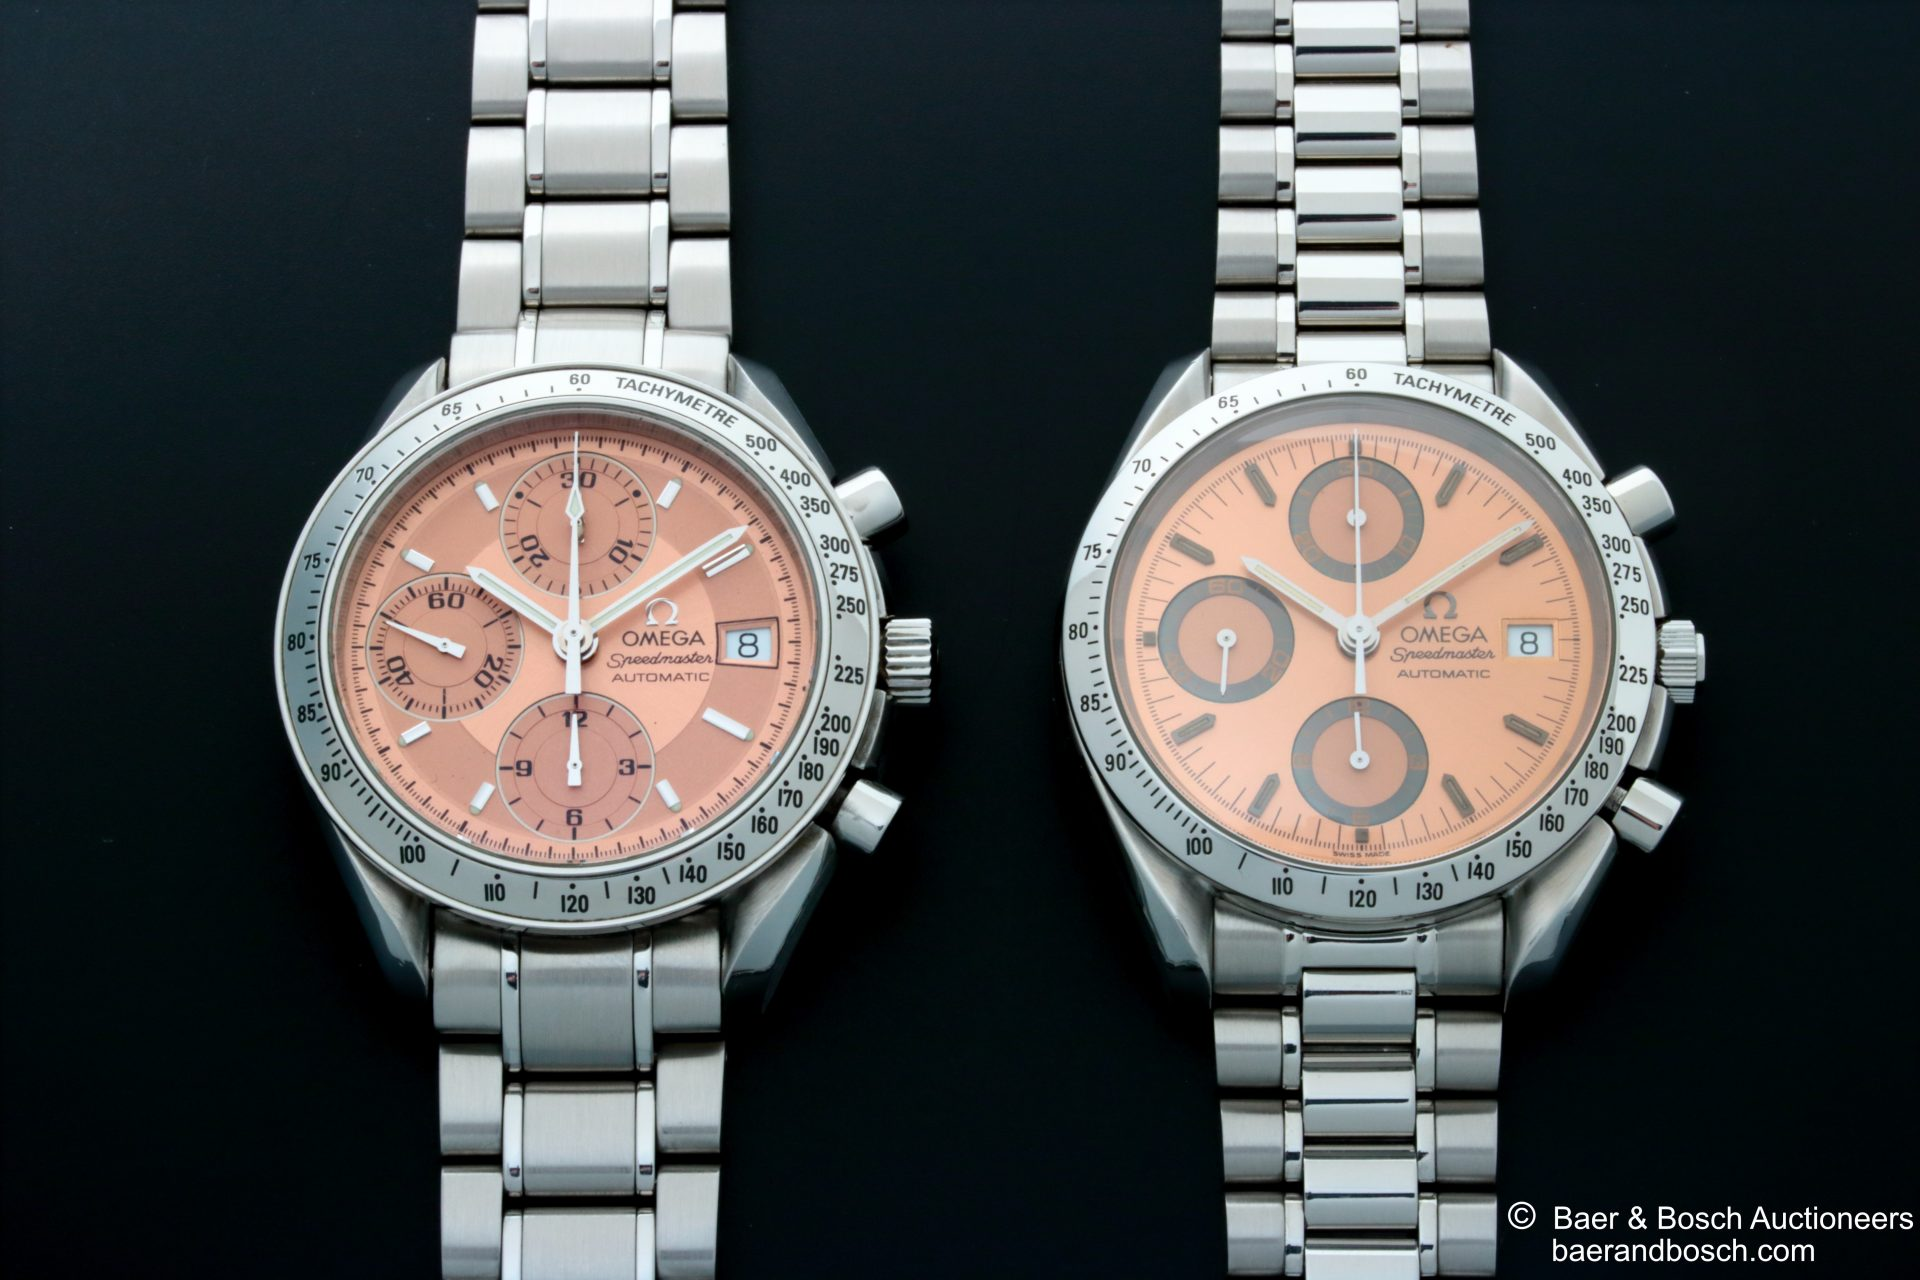 Omega Speedmaster 3513.60 vs Omega Speedmaster 3511.60 - - Baer & Bosch Collecting Times